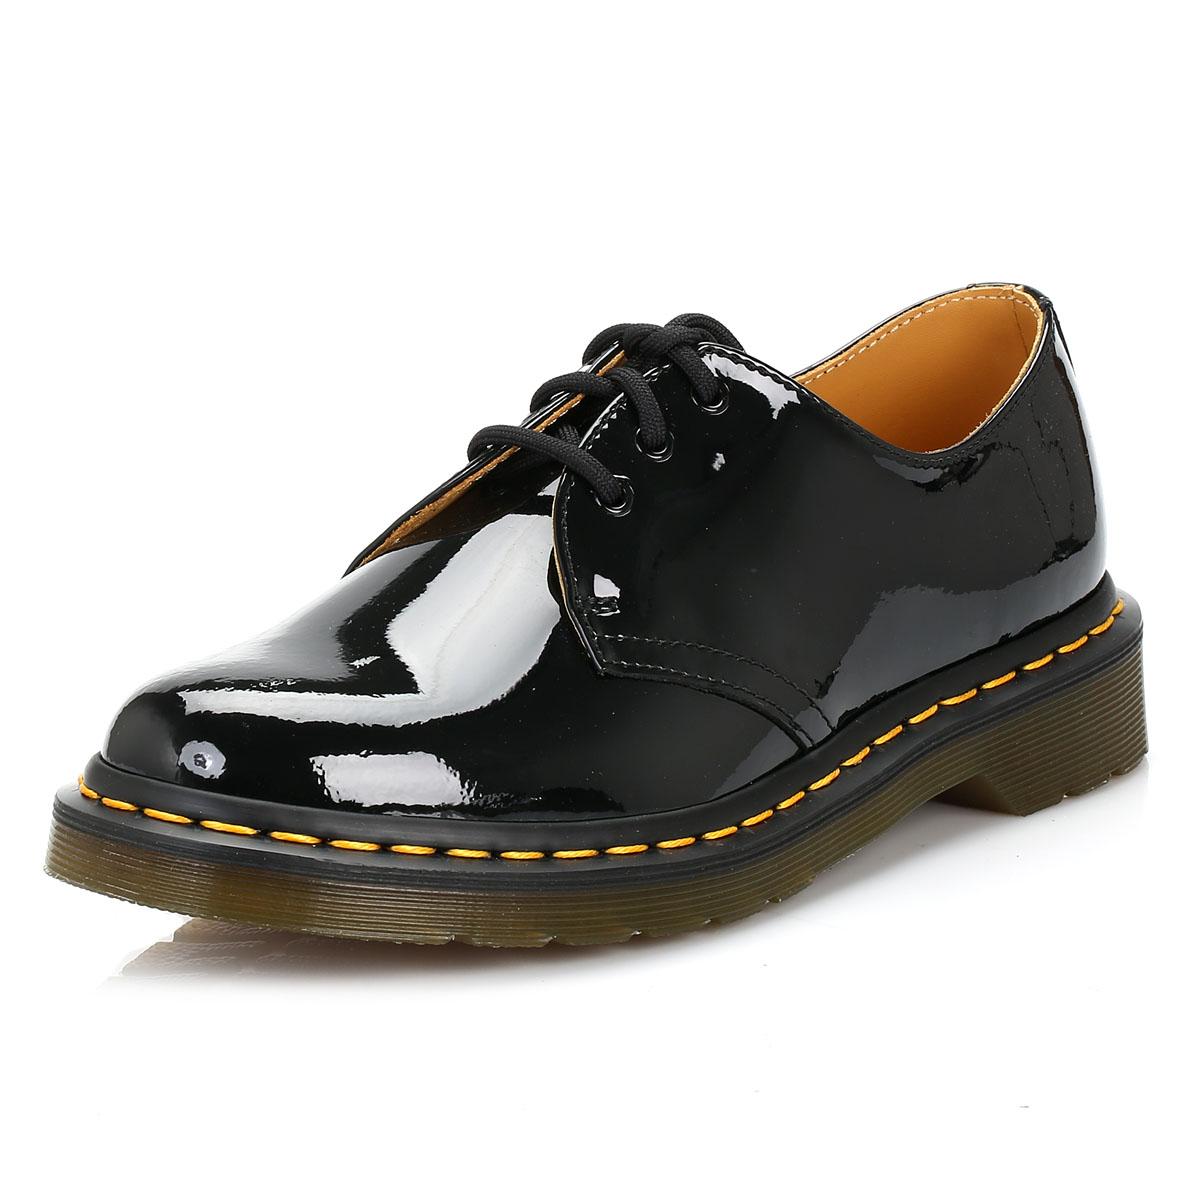 Dr. Martens Womens Black Up, 1461 Derby Shoes, Lace Up, Black Patent Leather, Smart Docs 7f9448